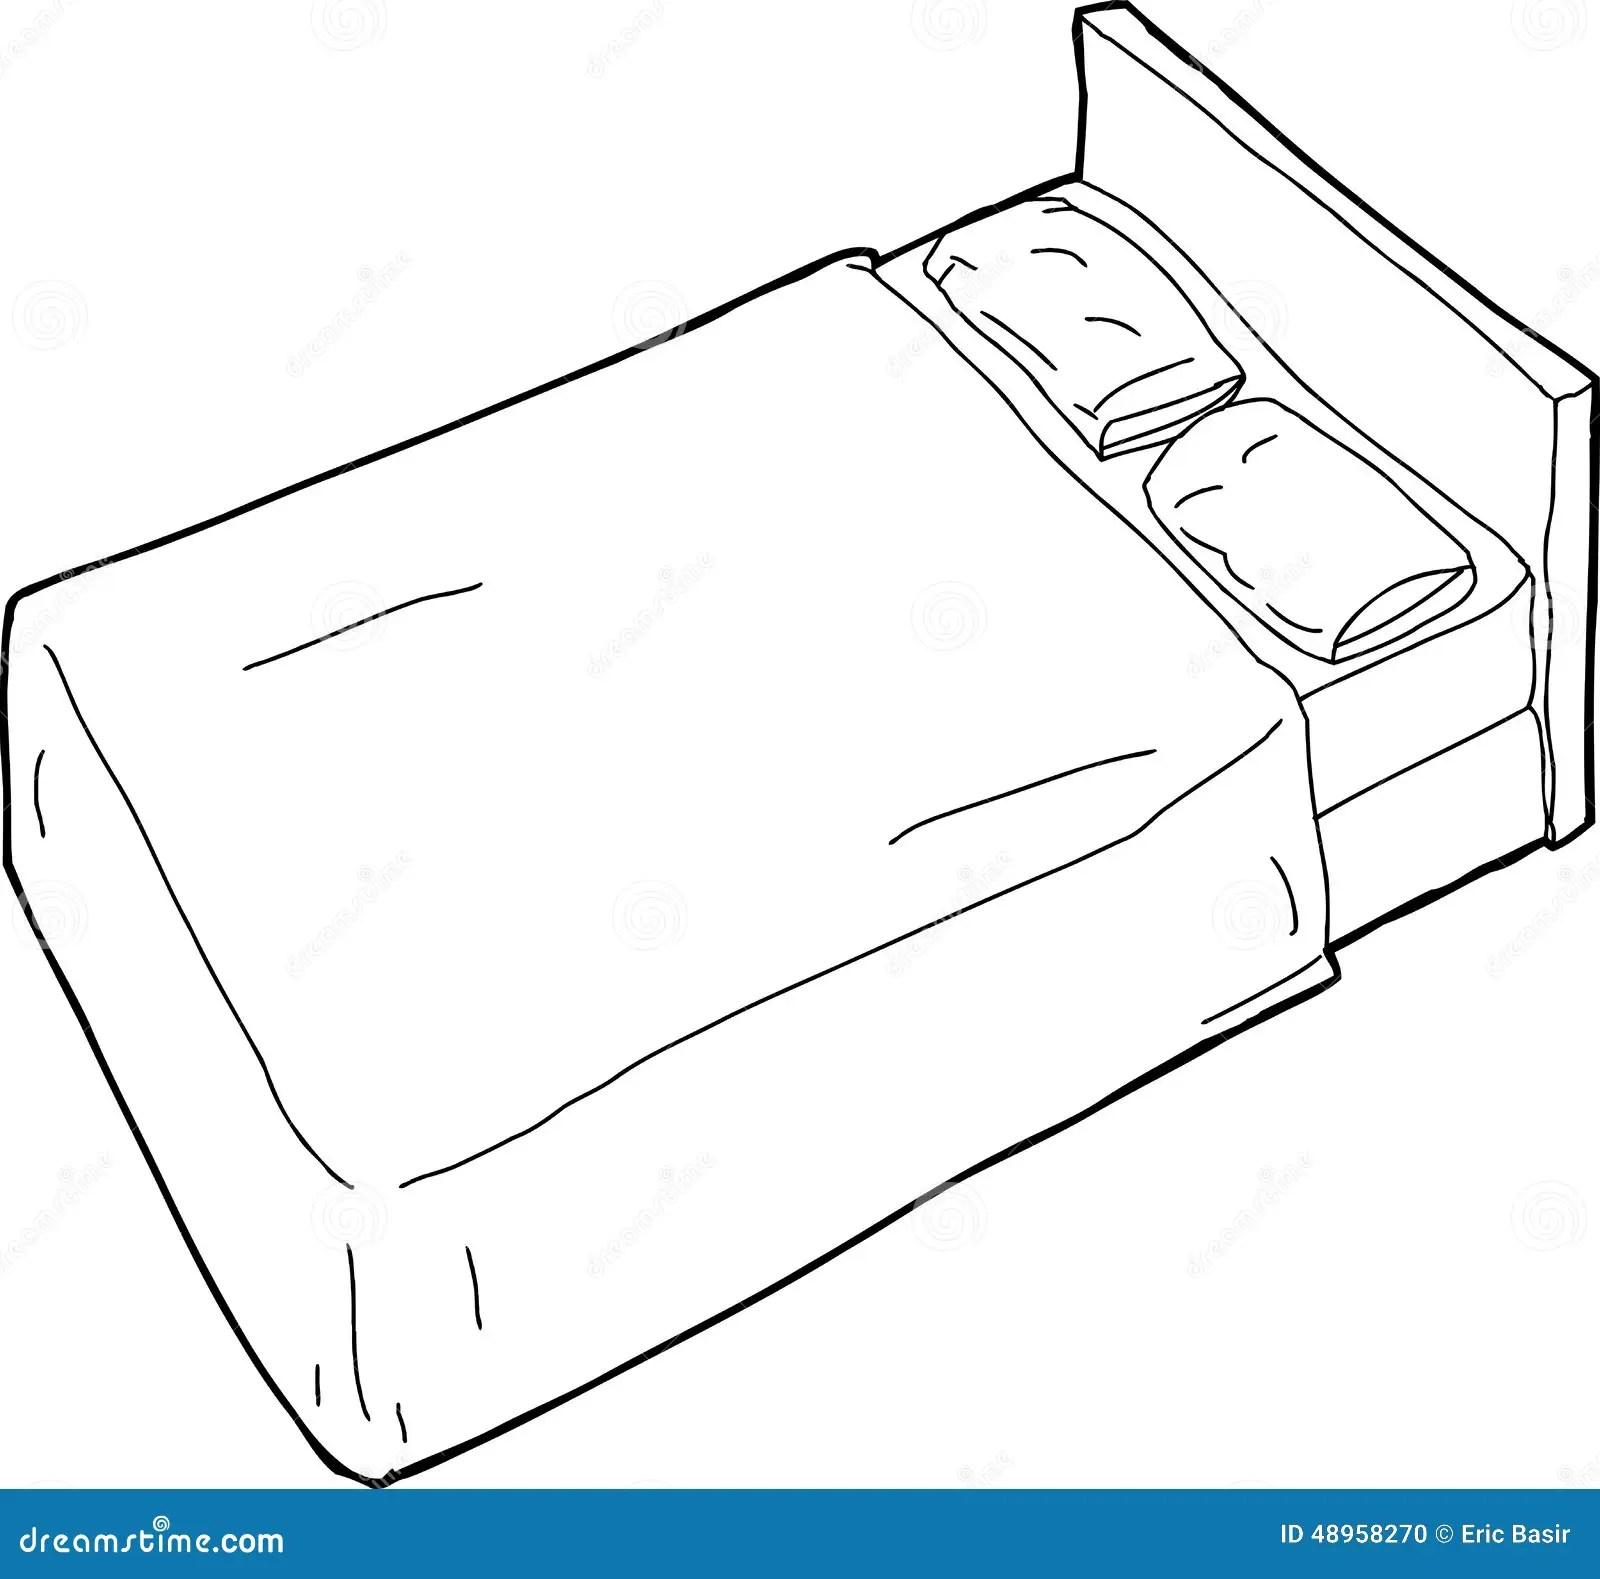 Outlined Bed Illustration Stock Illustration